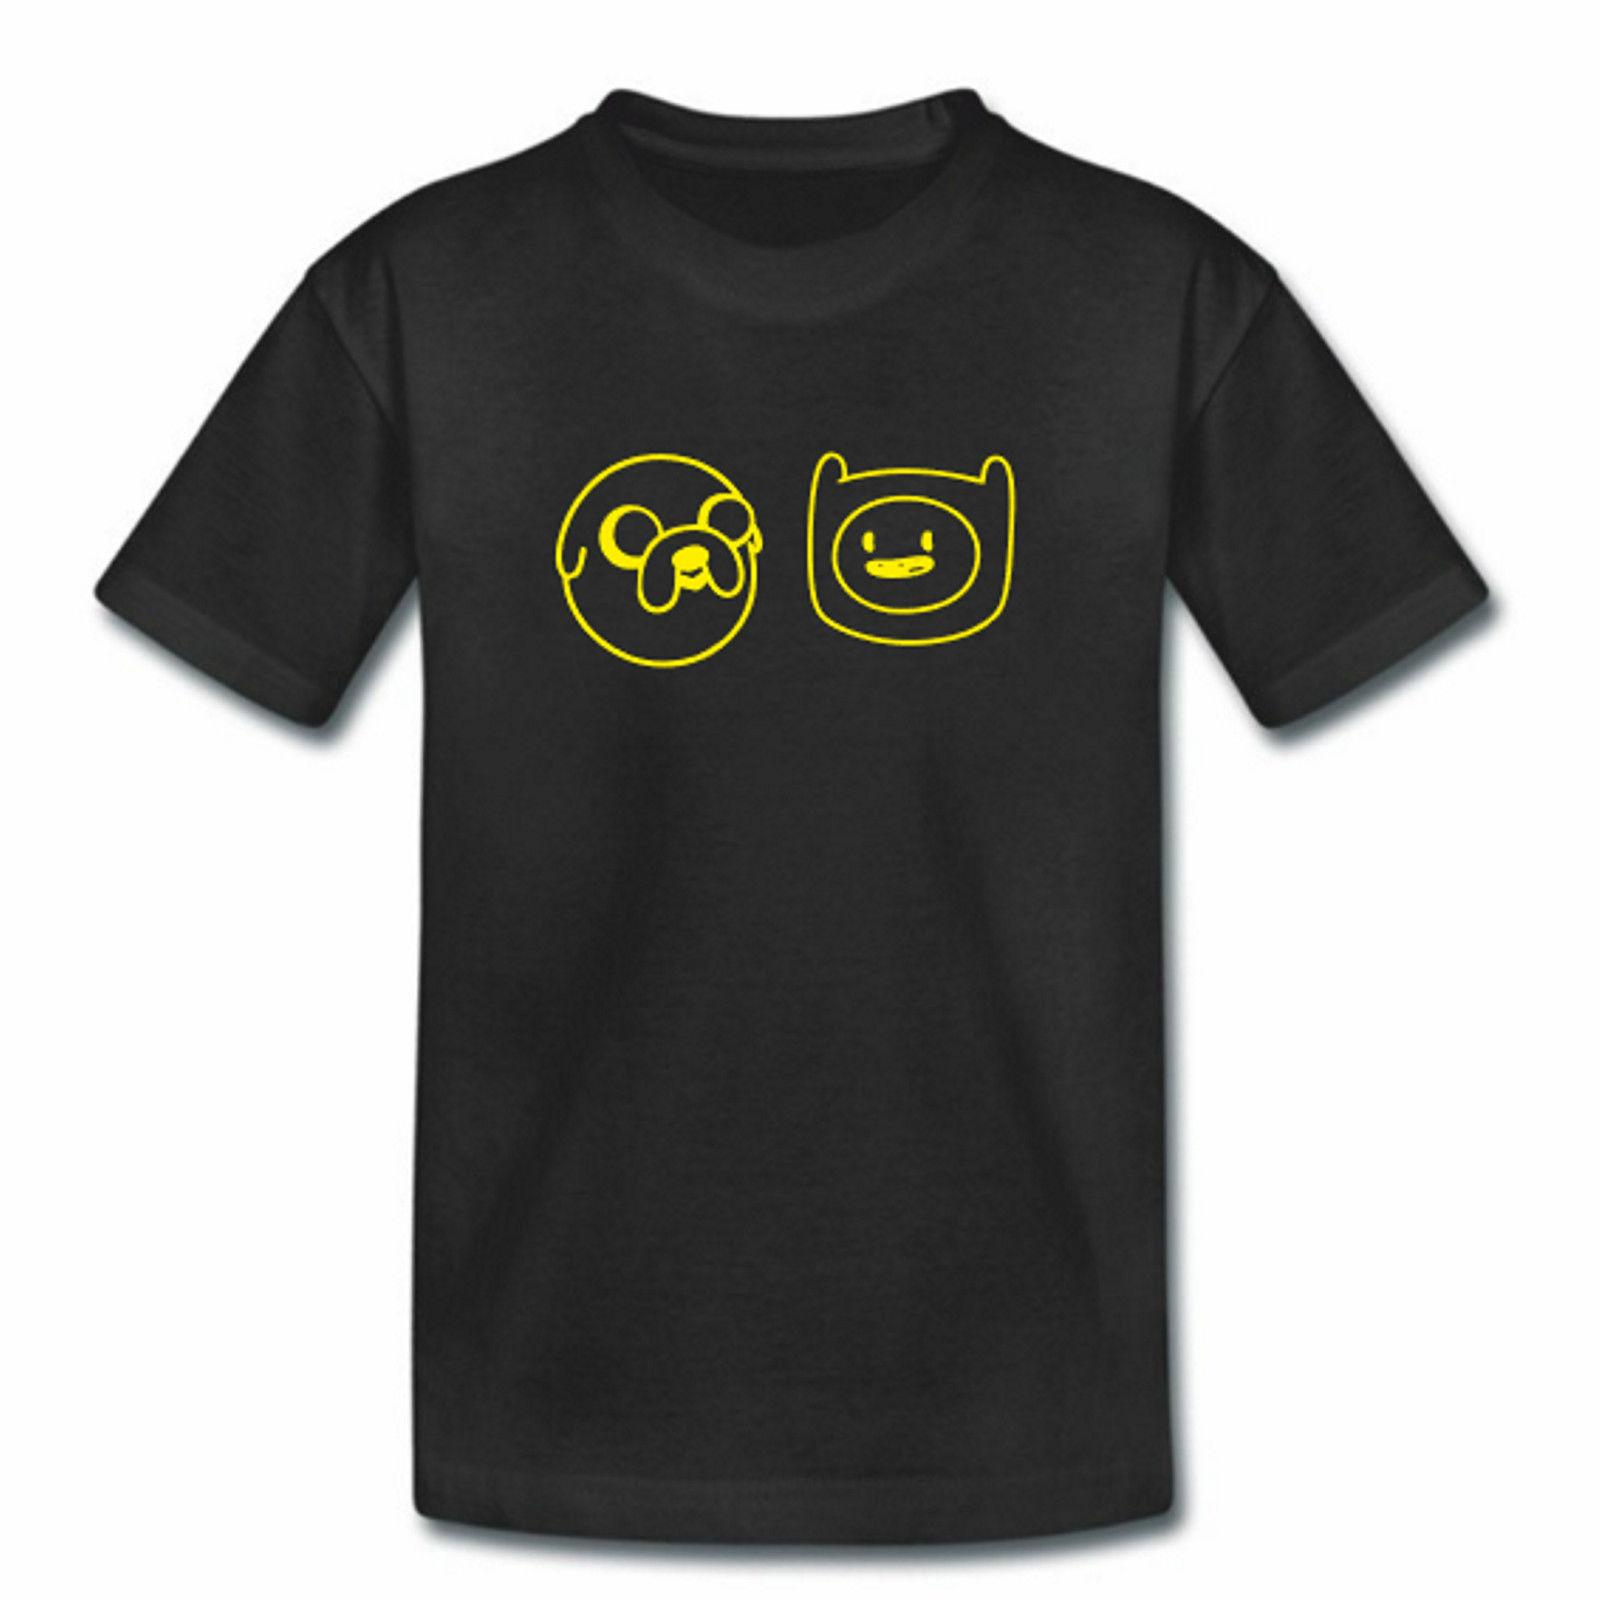 Tshirt Enfant - Finn Discount Jake - Garçons Filles - Jake The Dog